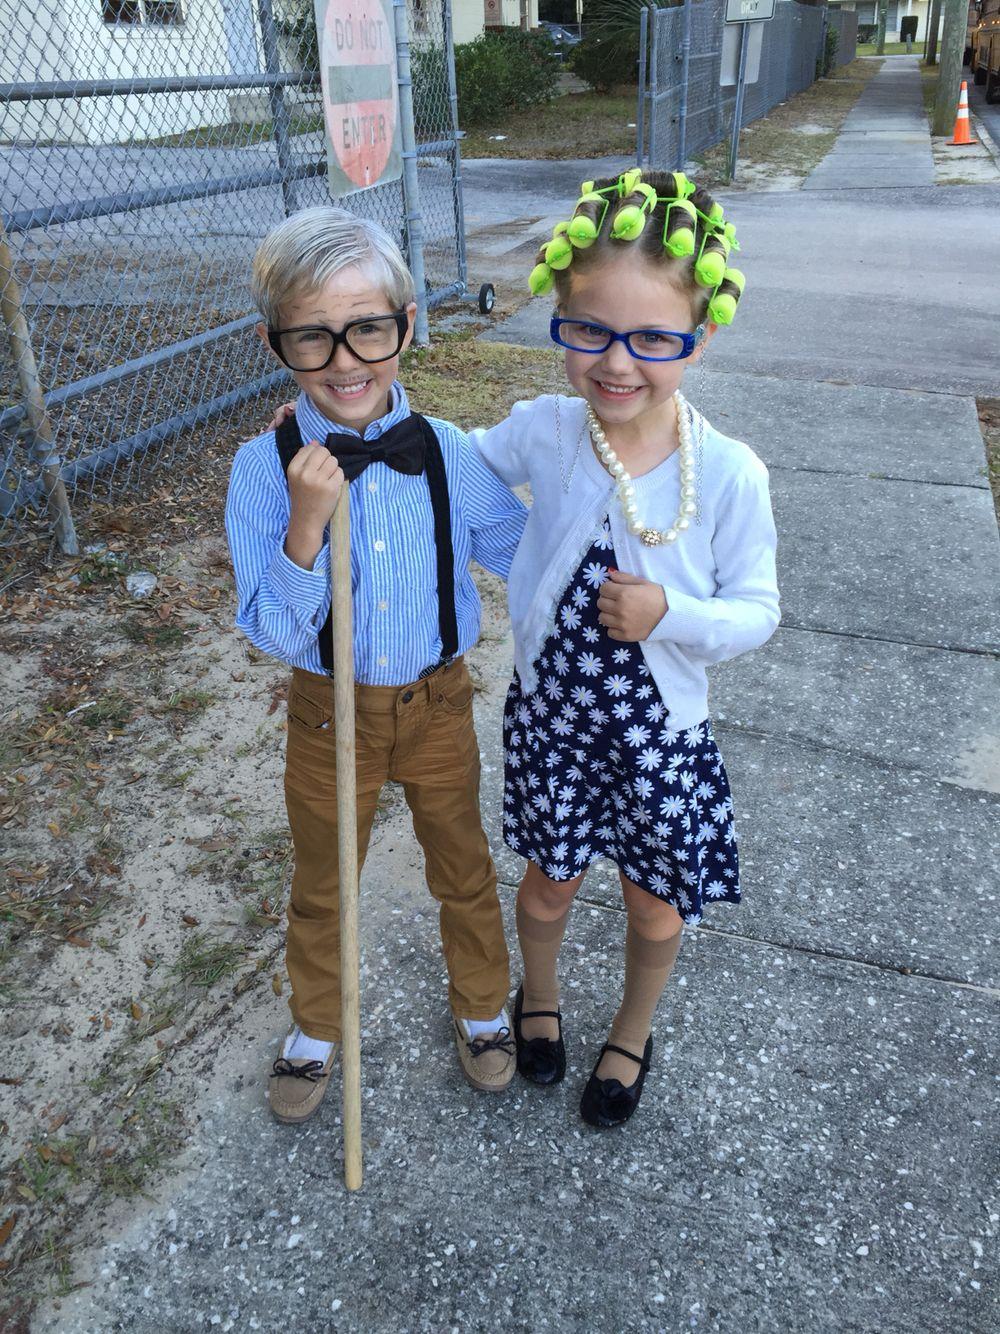 grandma grandpa halloween costumes - Google Search | Kids